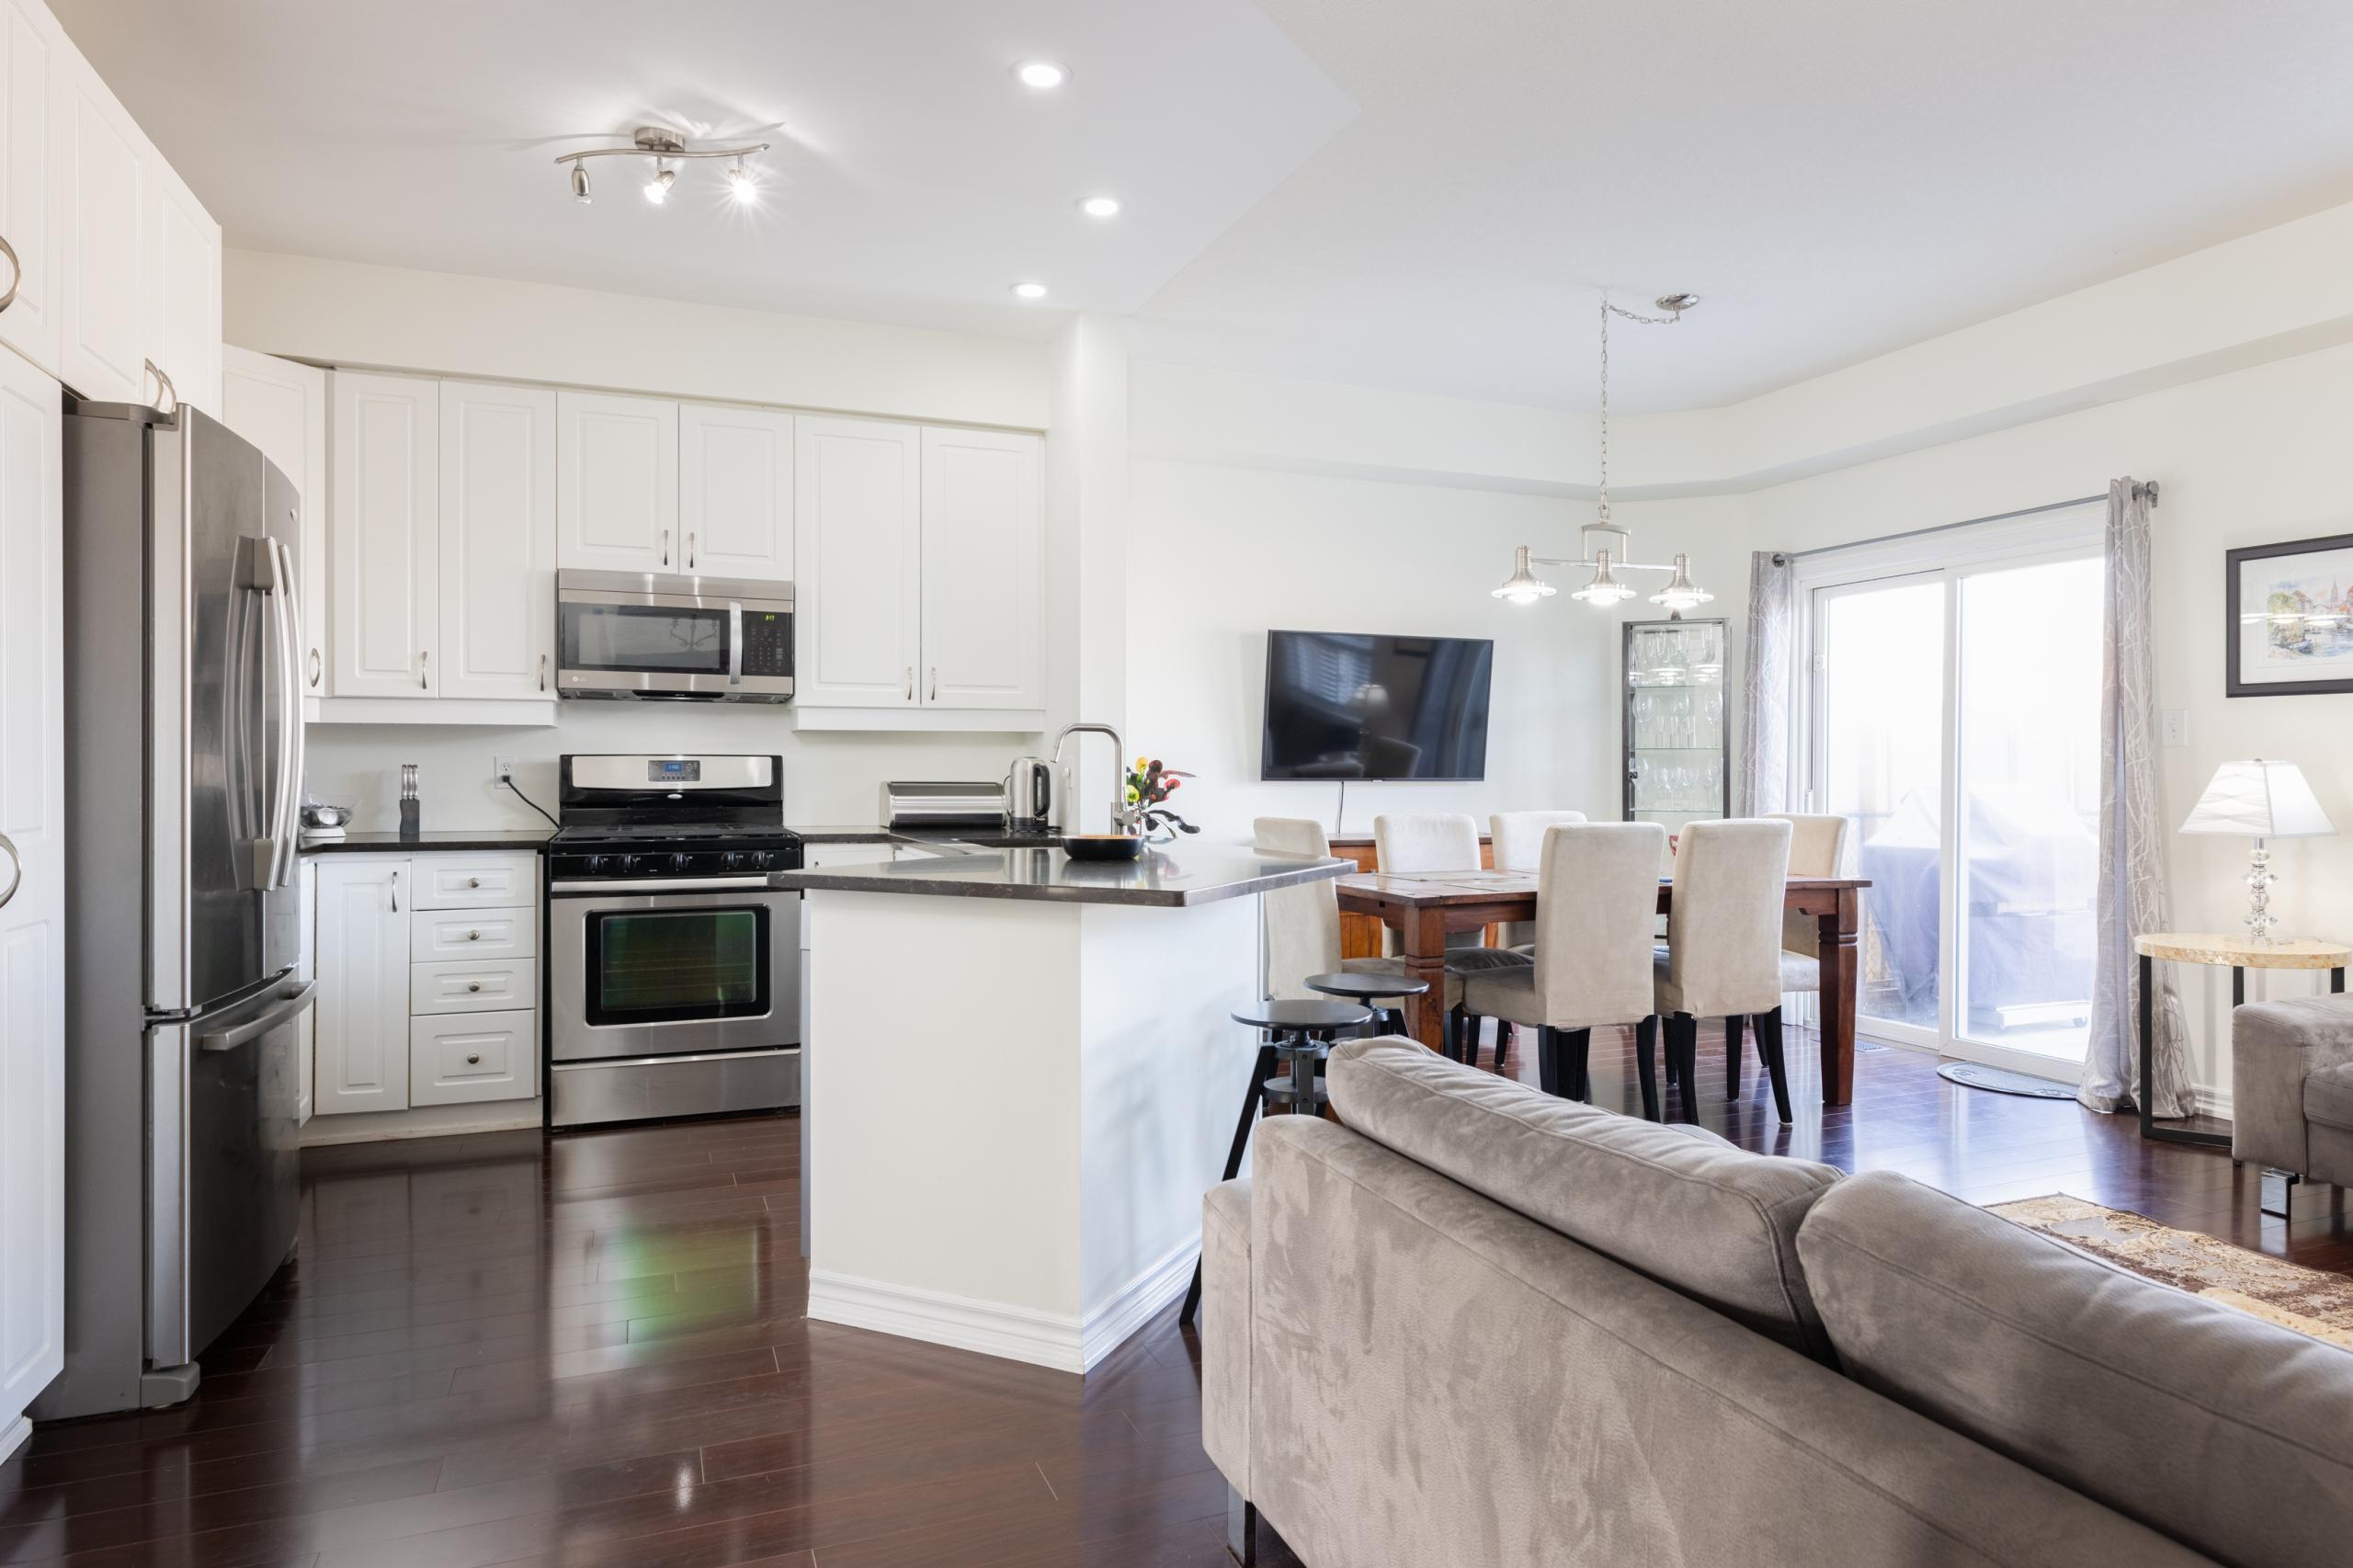 Kitchen featured at 5321 Scotia Street, Burlington at Alex Irish & Associates